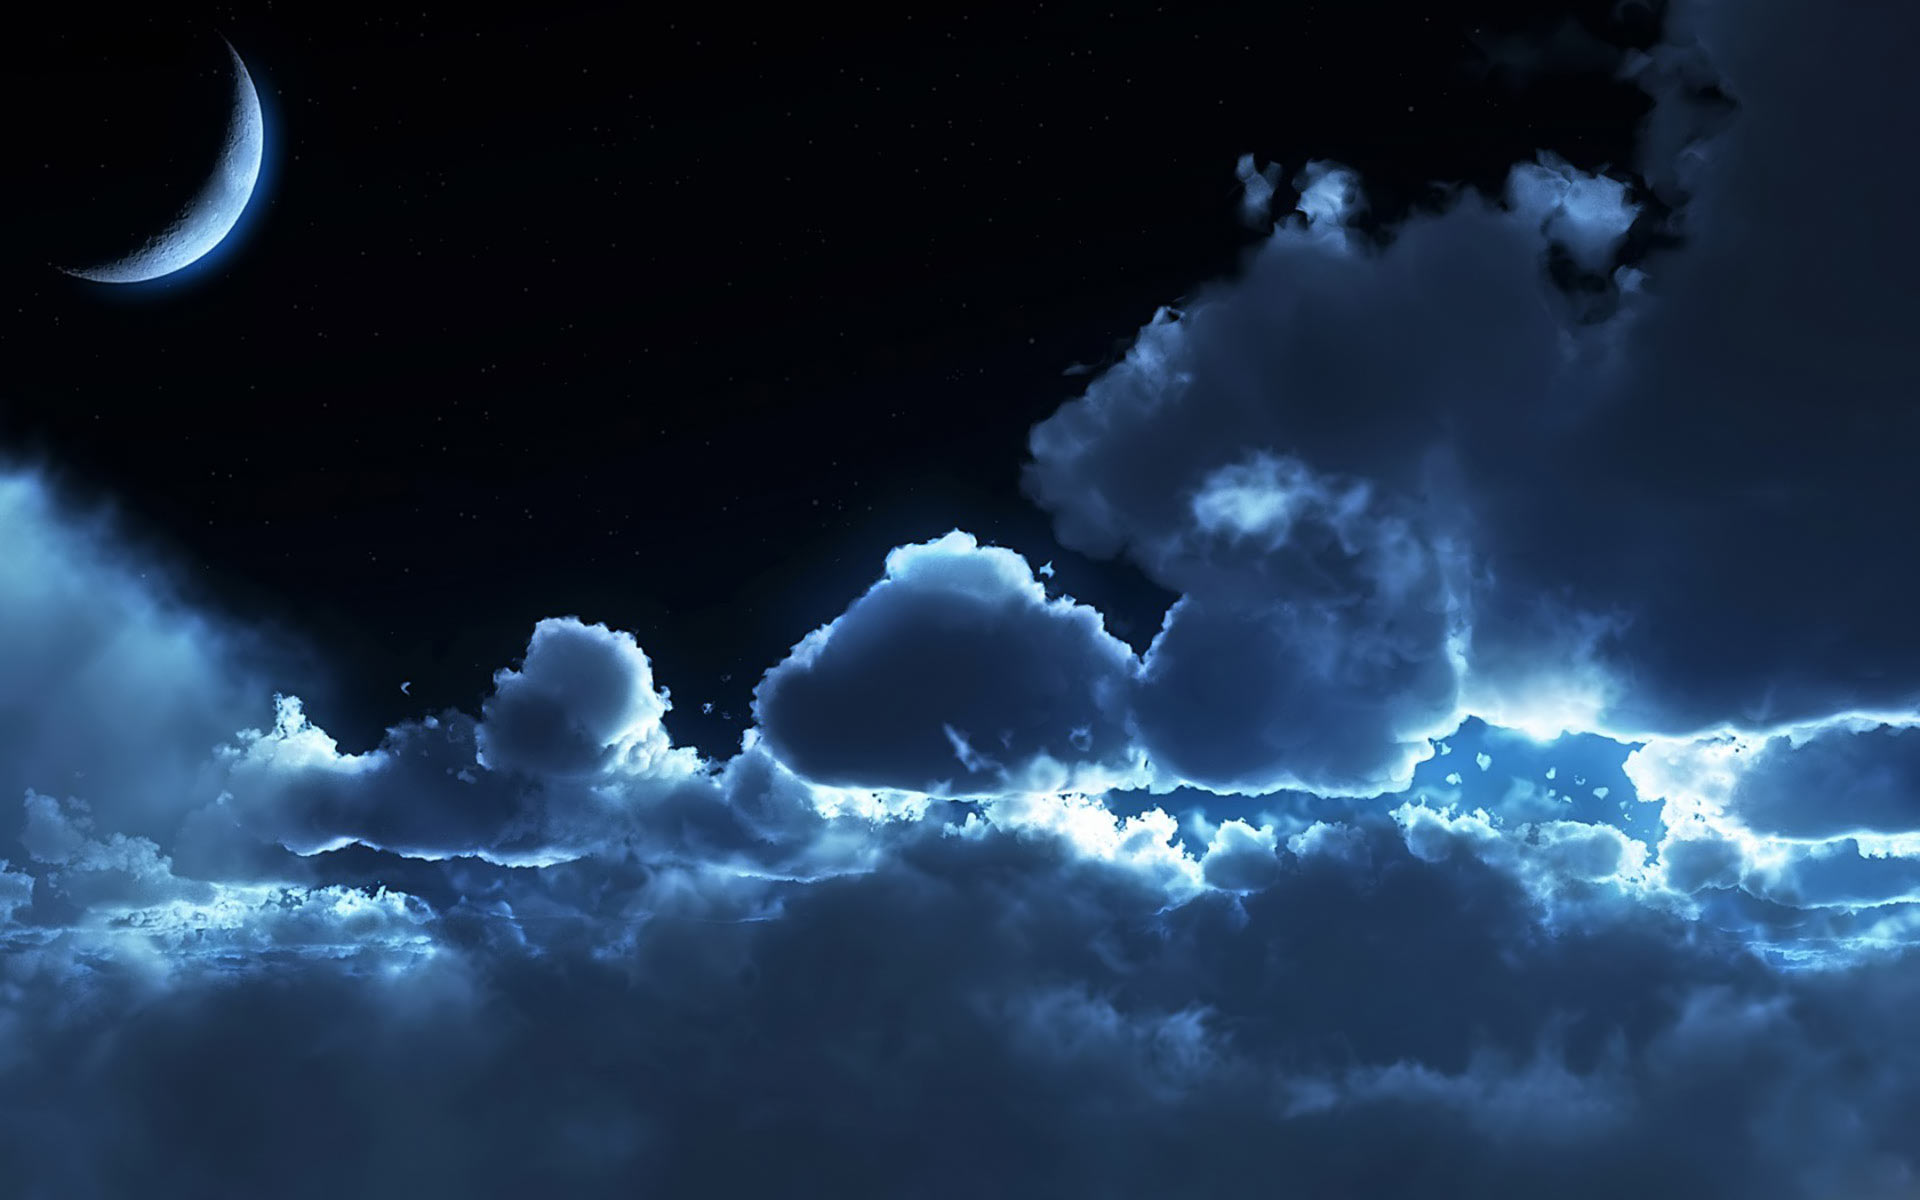 Dark Moon cloudy sky Wallpaper hd background   HD Wallpapers 1920x1200